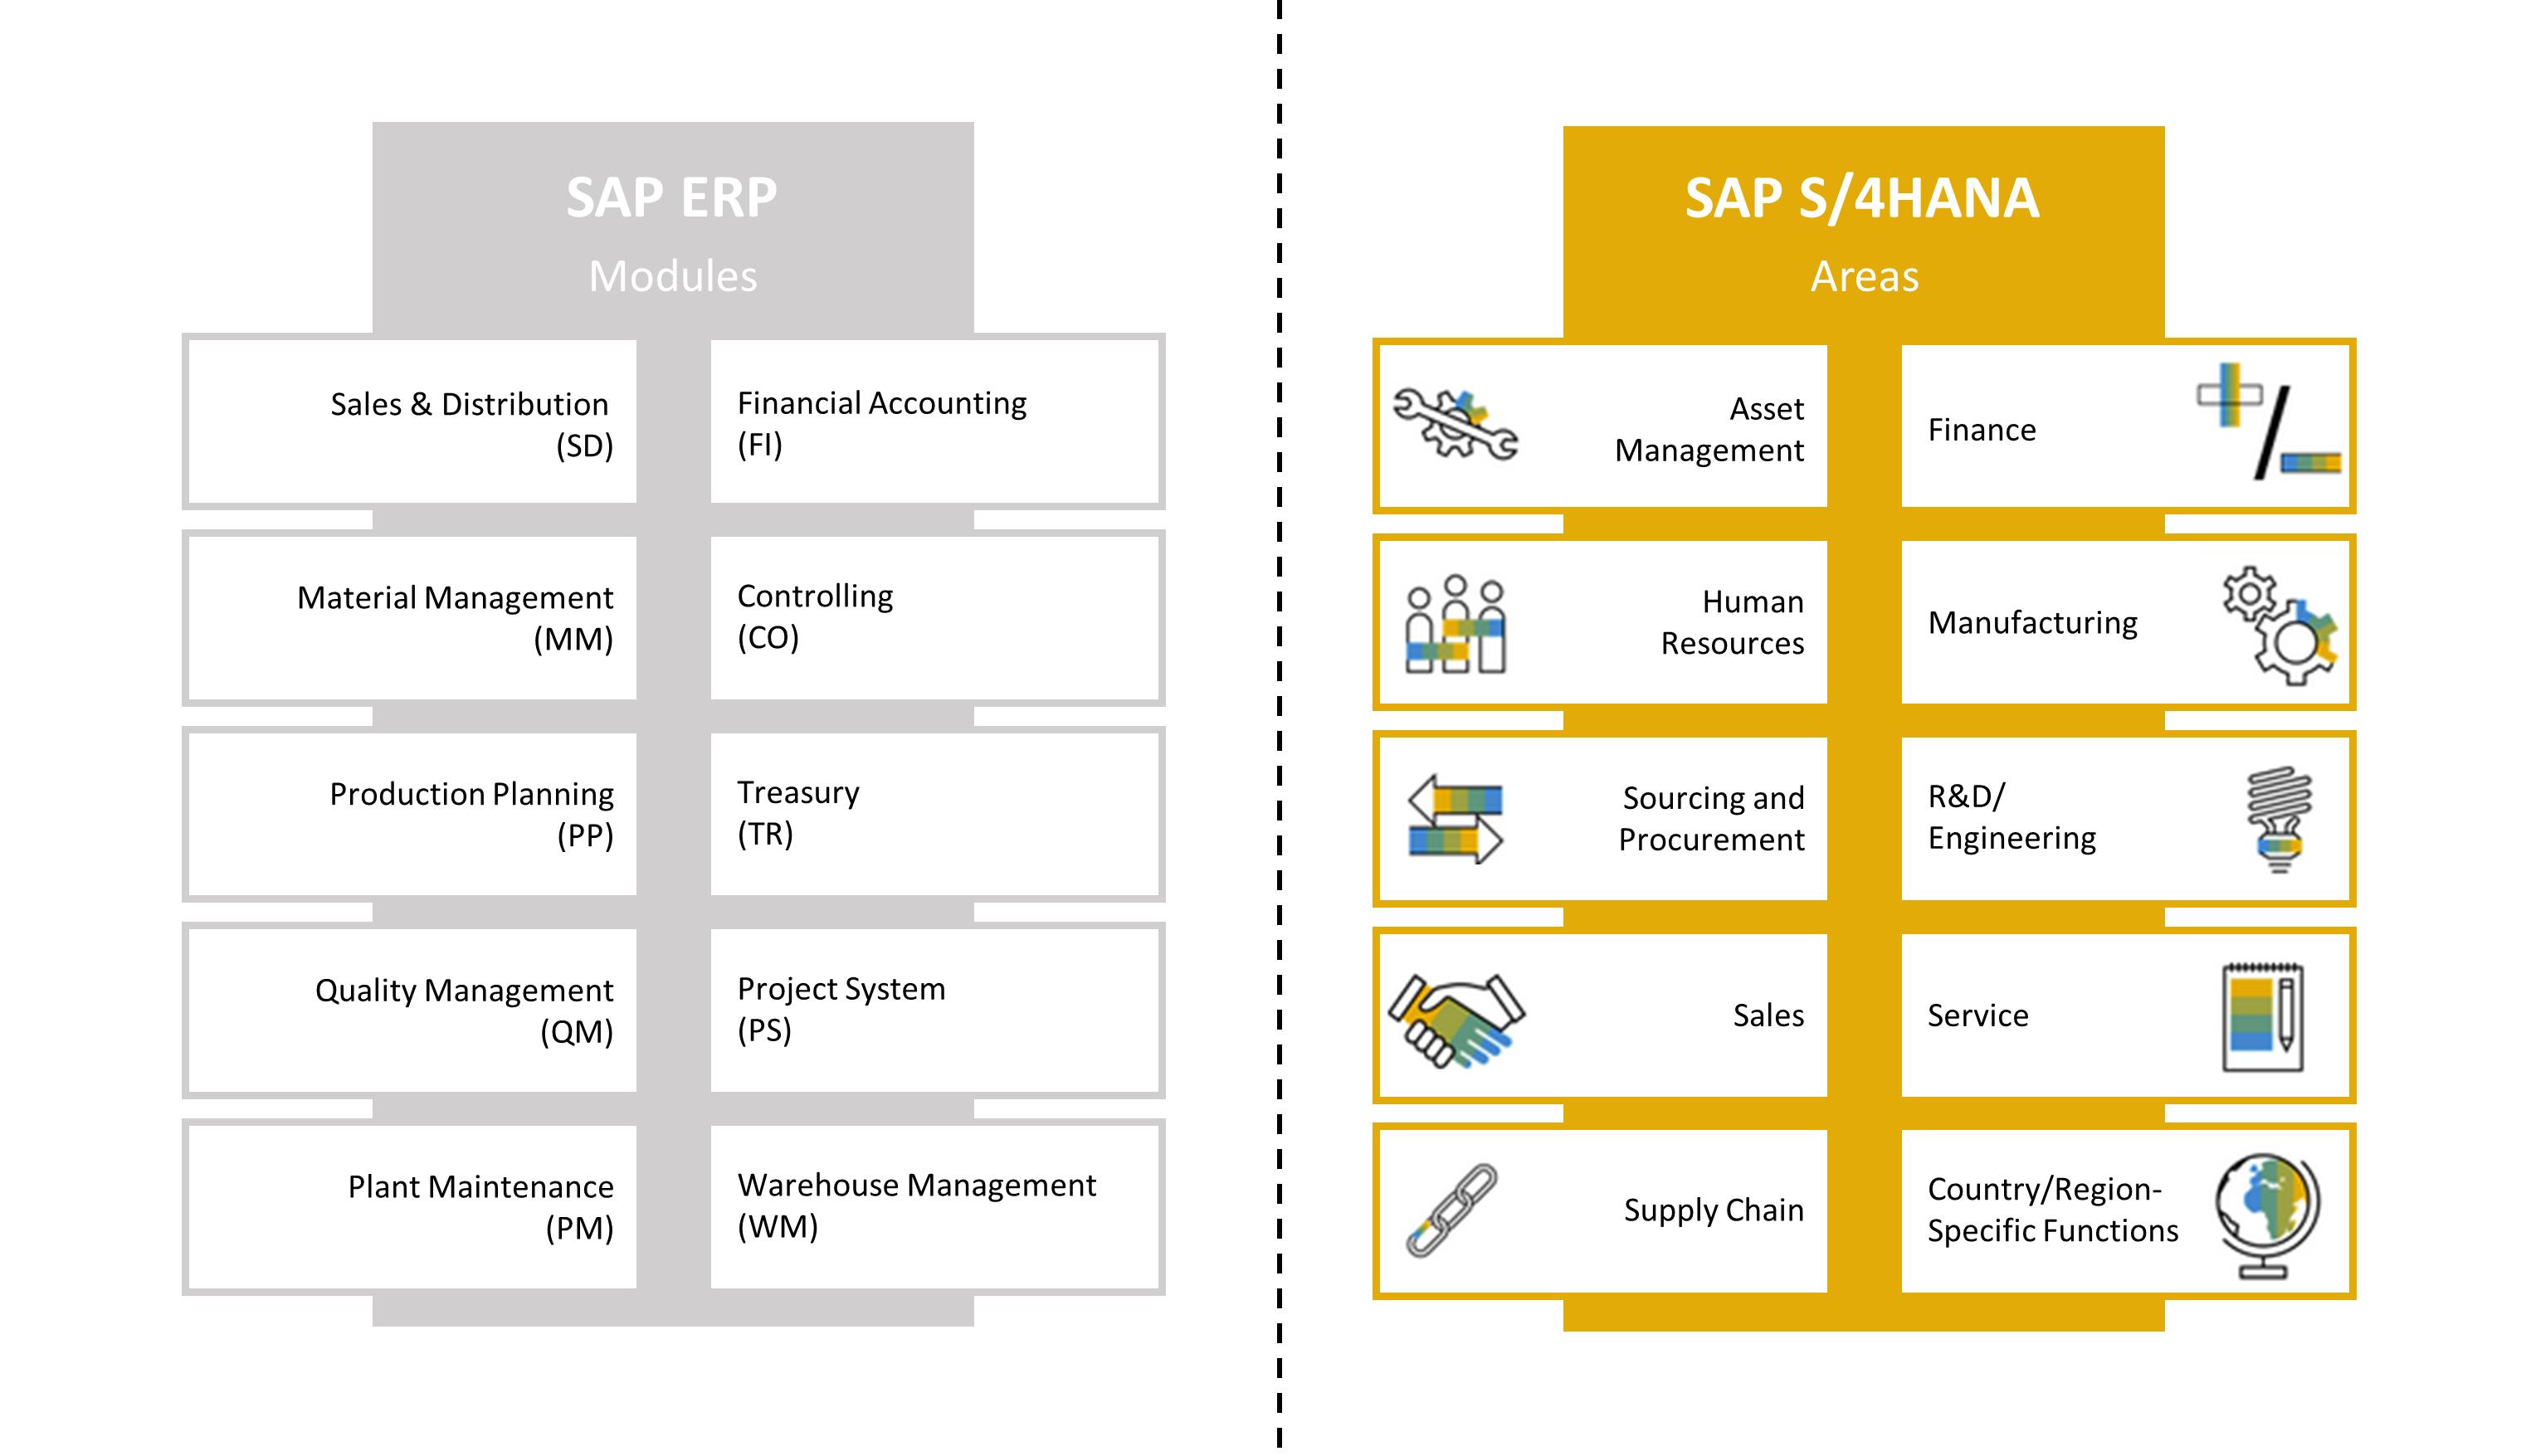 SAP ECC vs SAP S4HANA - Module vs Business Areas